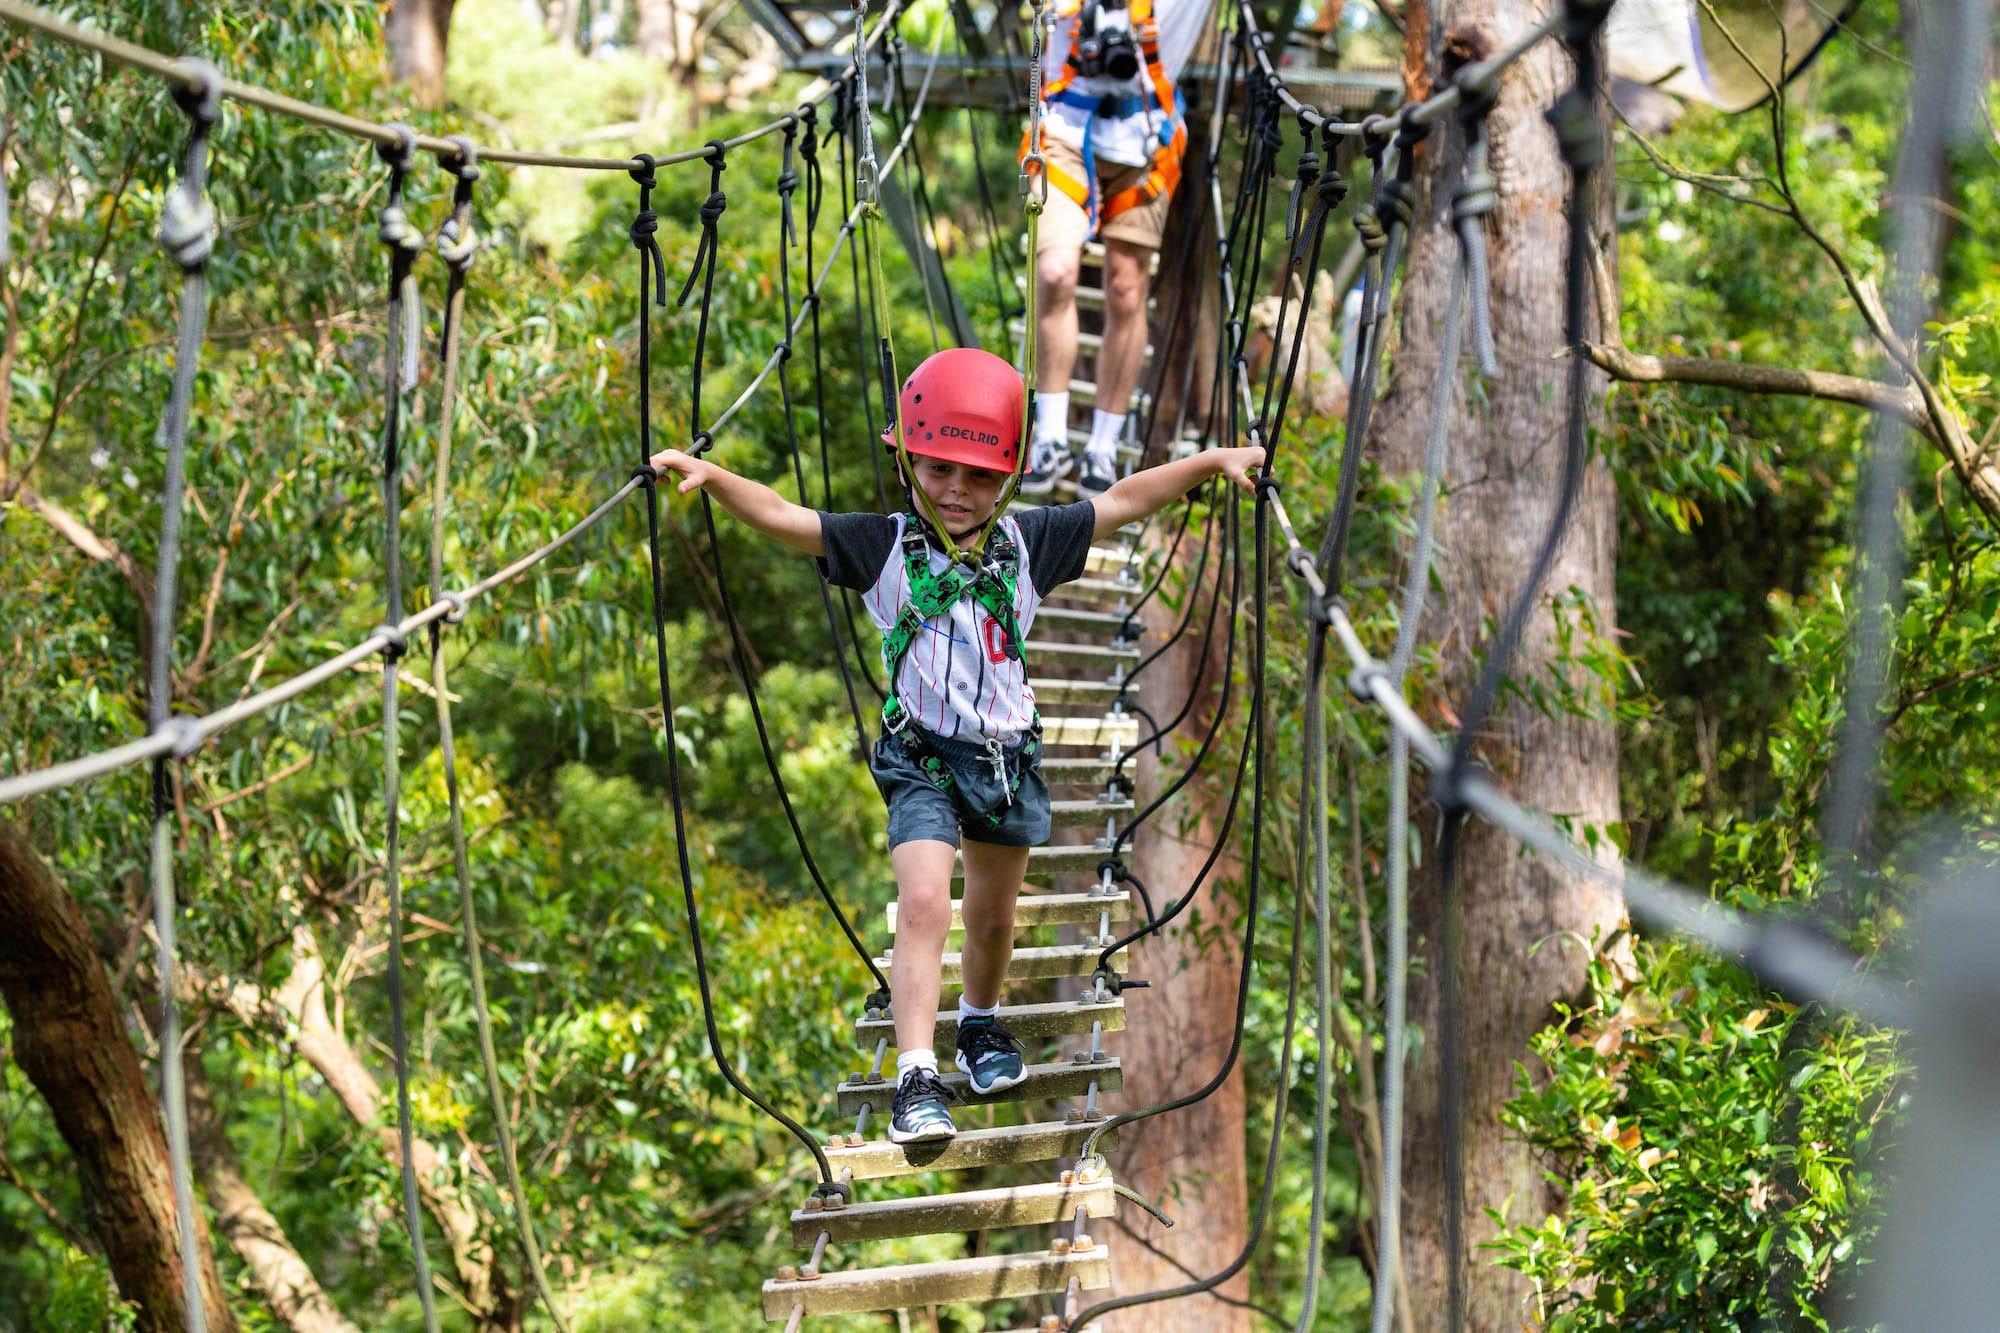 Illawarra Fly Treetop Zipline Adventure - Southern Highlands, NSW